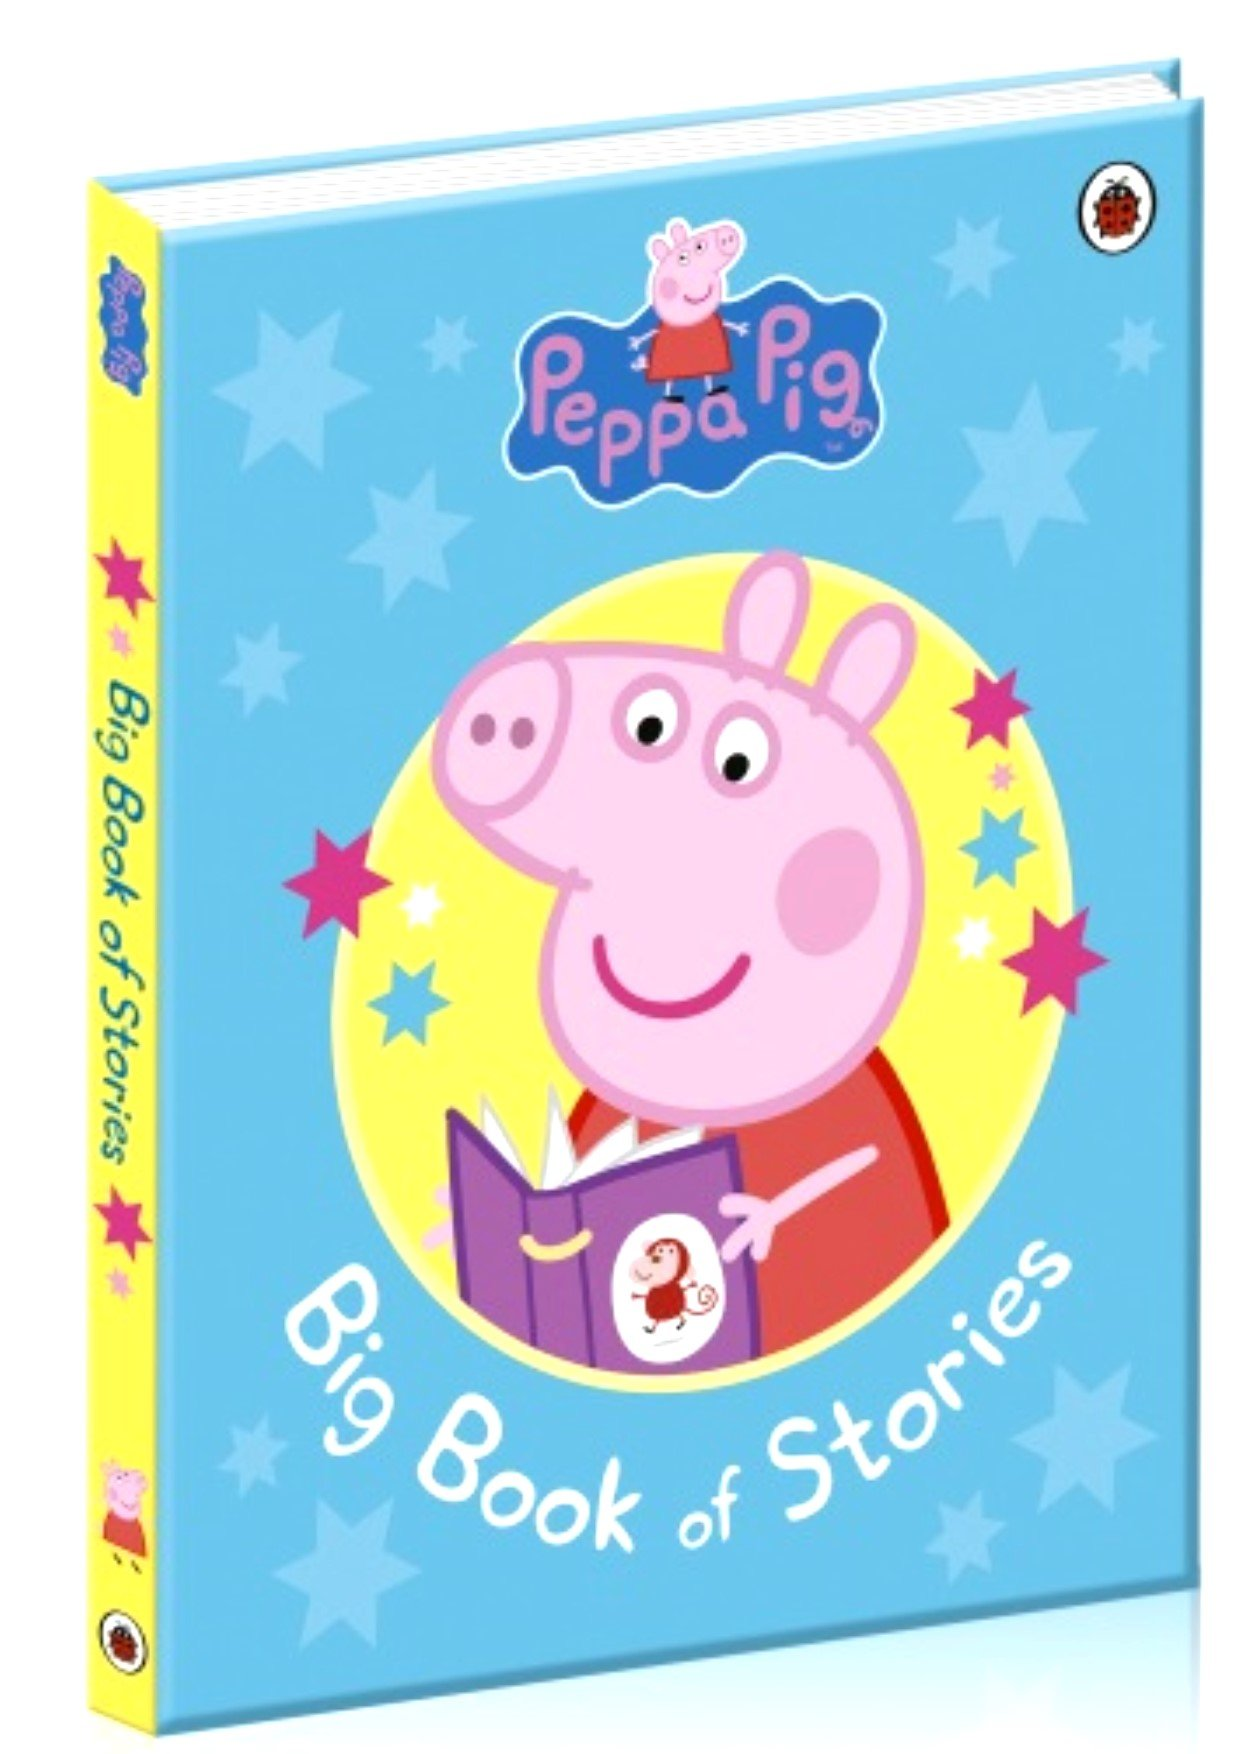 Peppas Big Book Of Stories Treasury 9780241241608 Books Peppa Pig First Sleepover